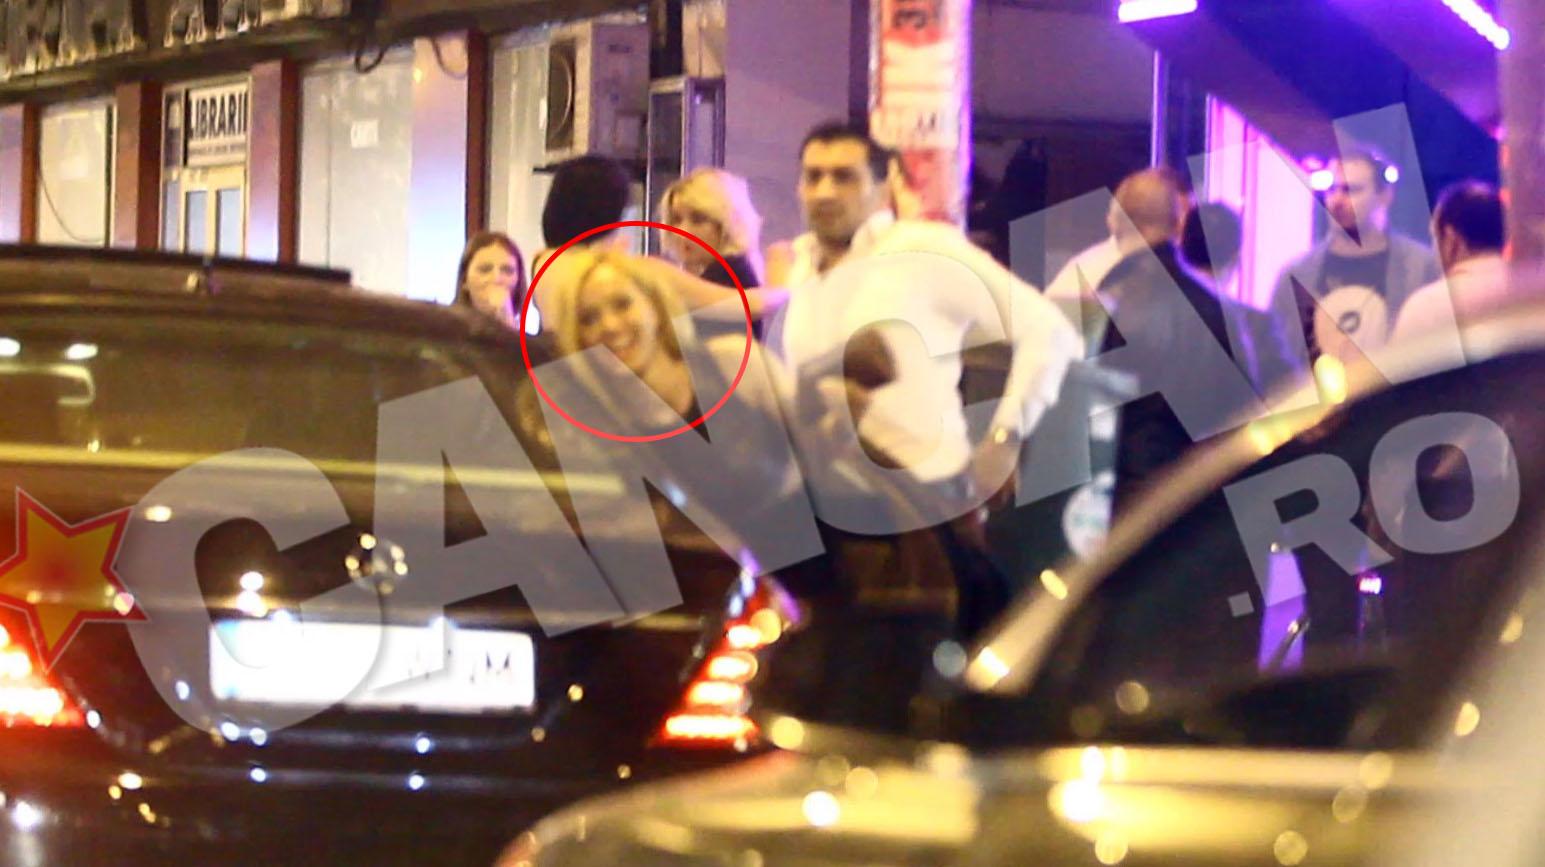 Blonda care i-a tinut companie lui Sorinel pe bancheta din spate coboara din limuzina